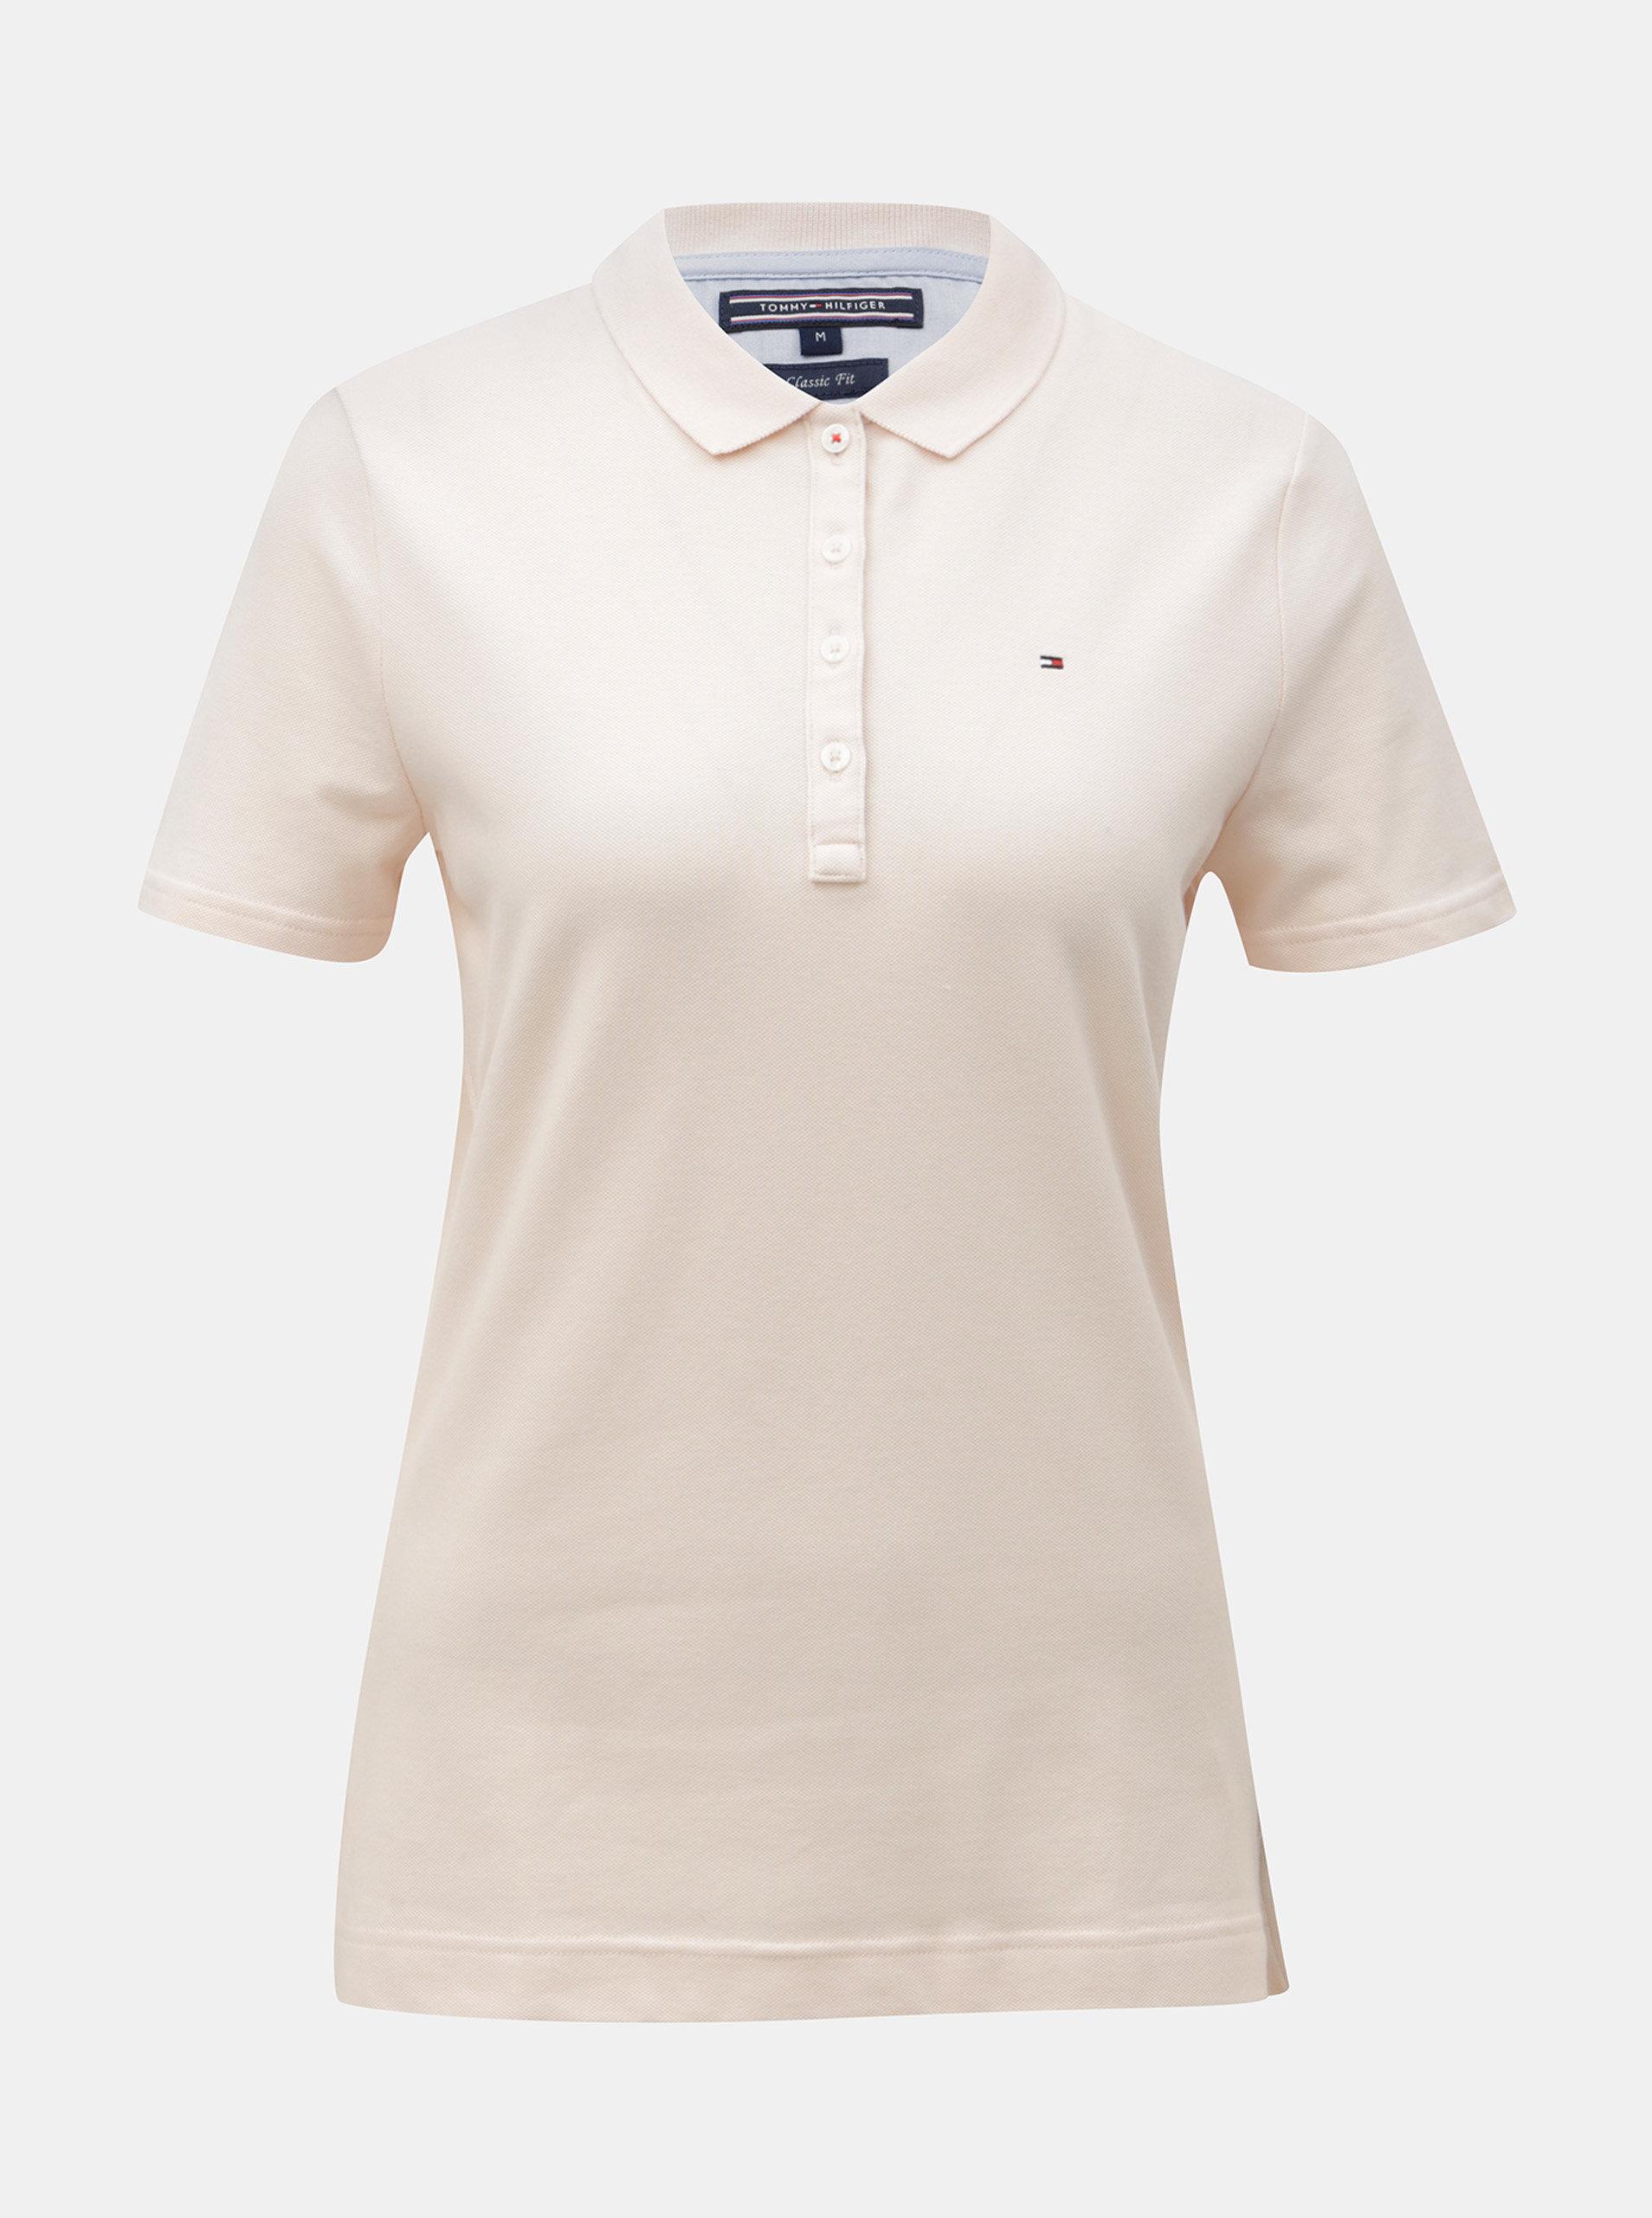 Svetloružové dámske polo tričko Tommy Hilfiger ... 61629d9198